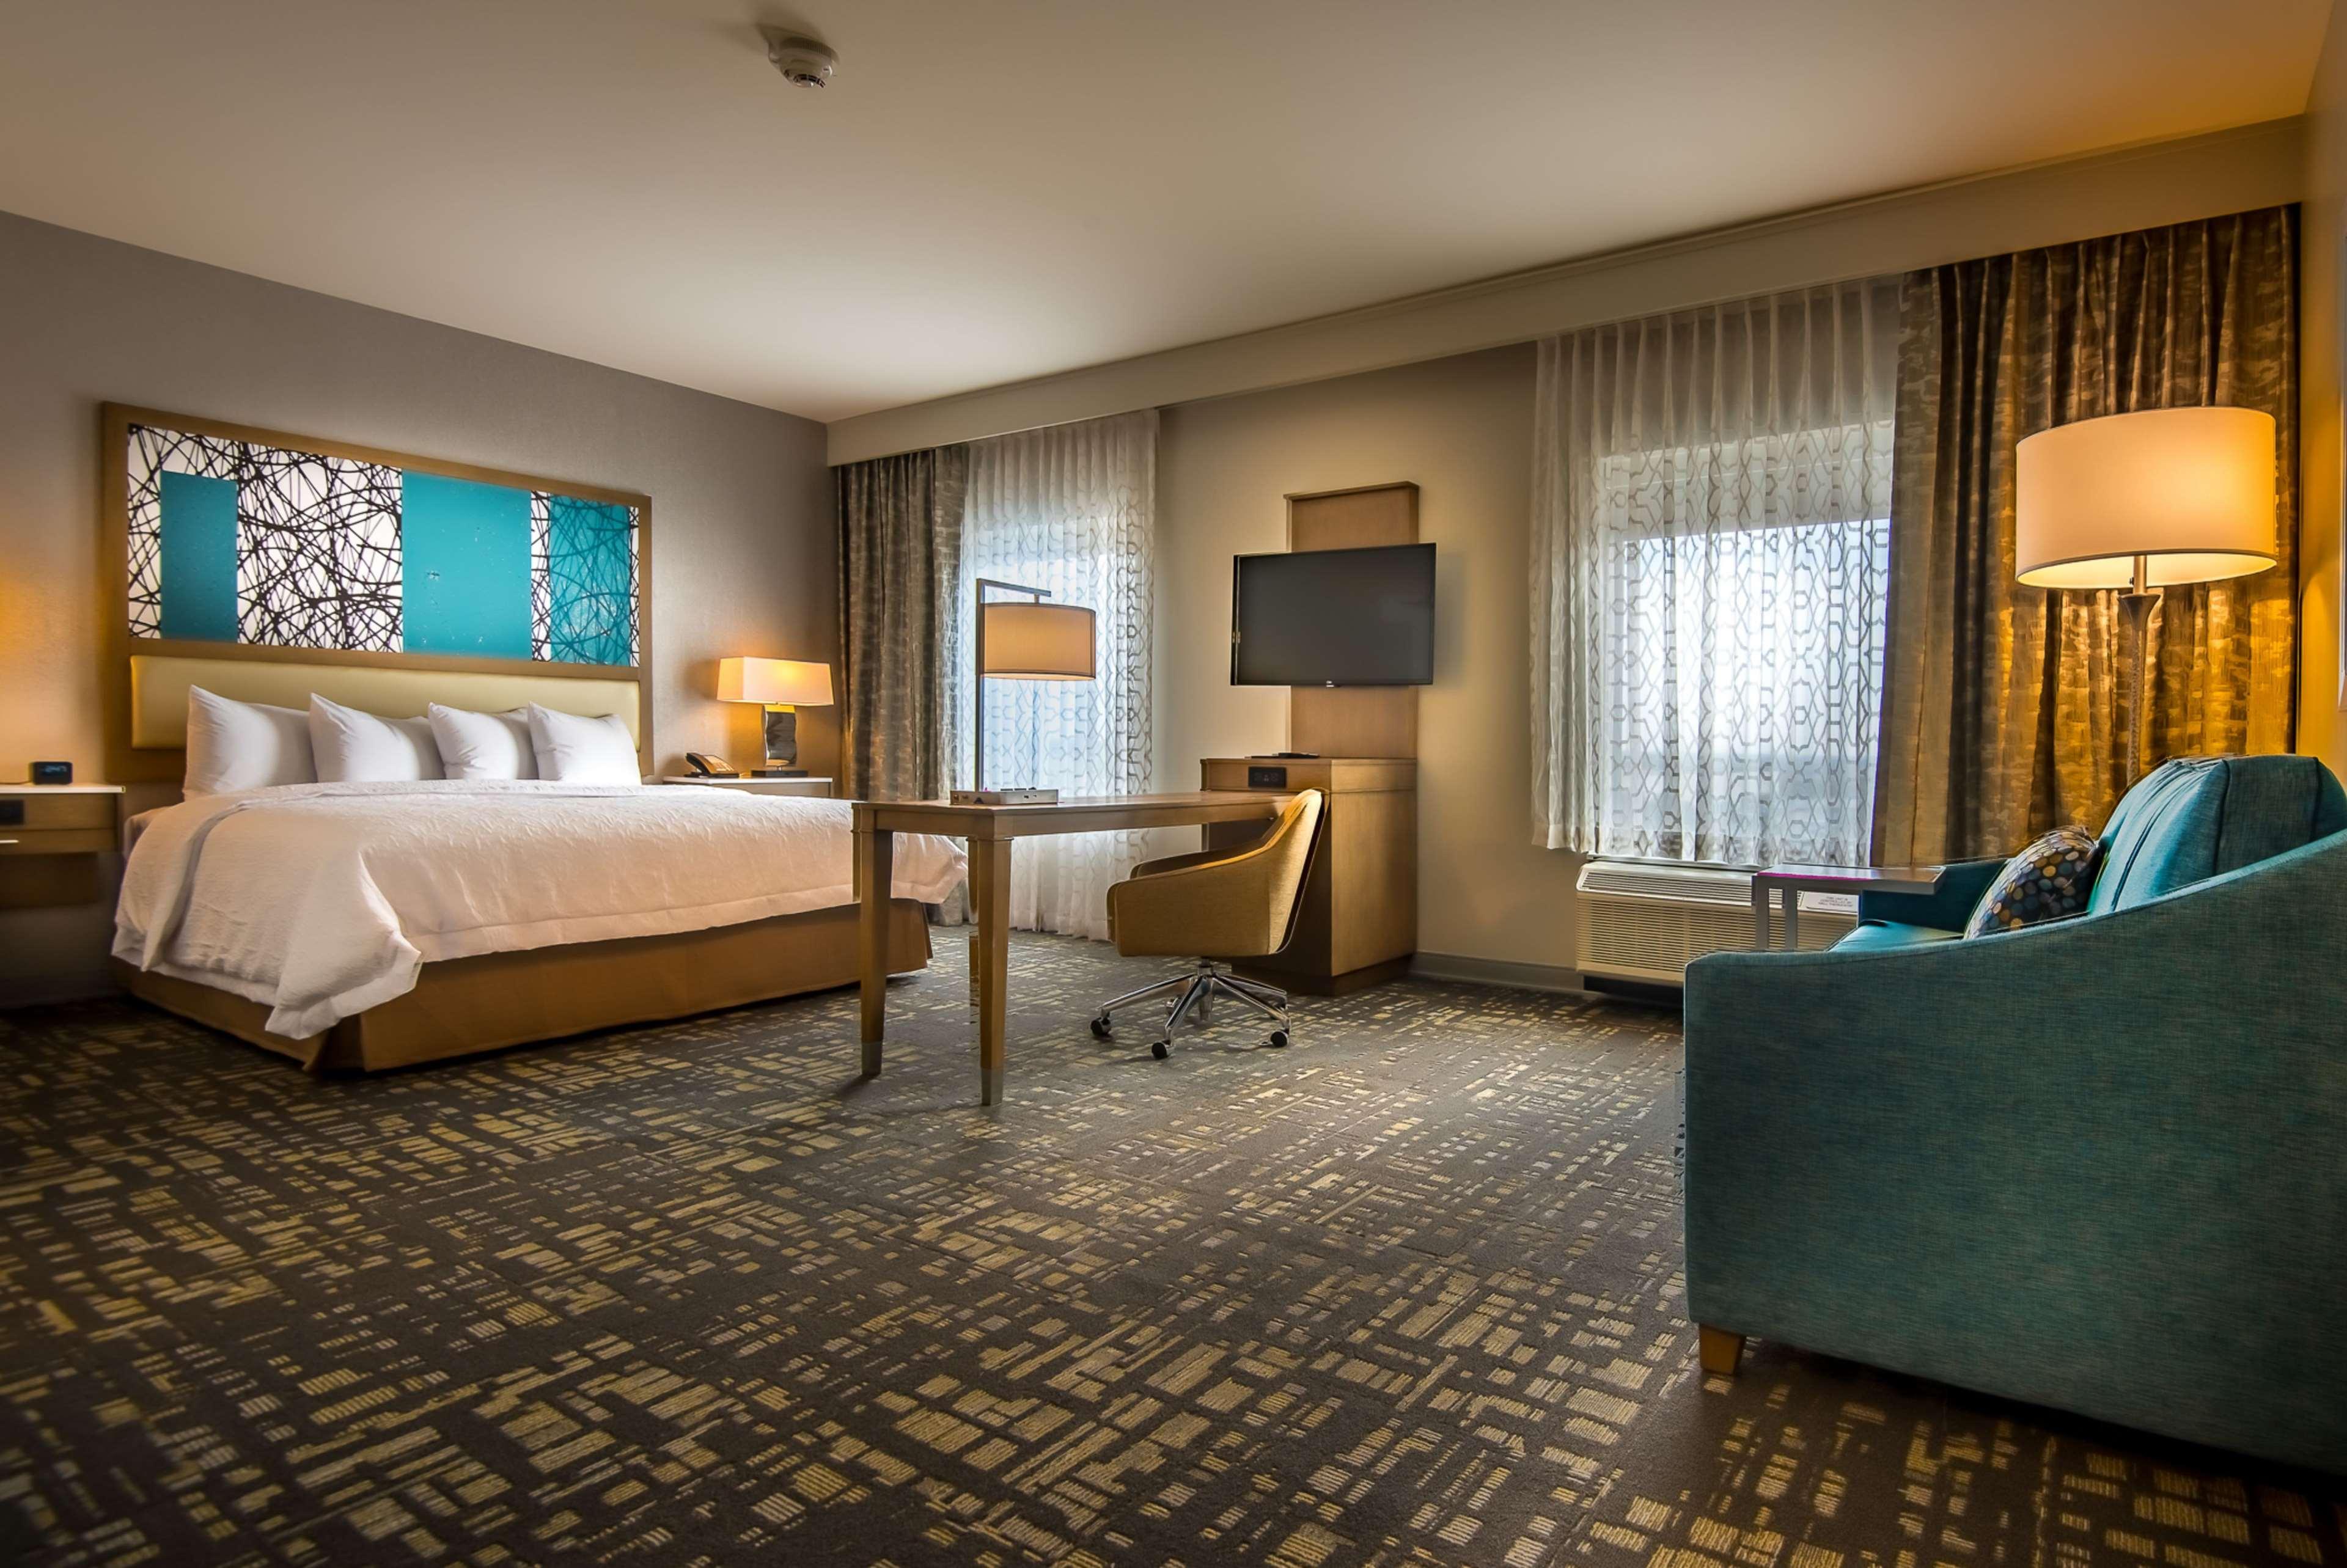 Hampton Inn & Suites Dallas-The Colony, TX image 19